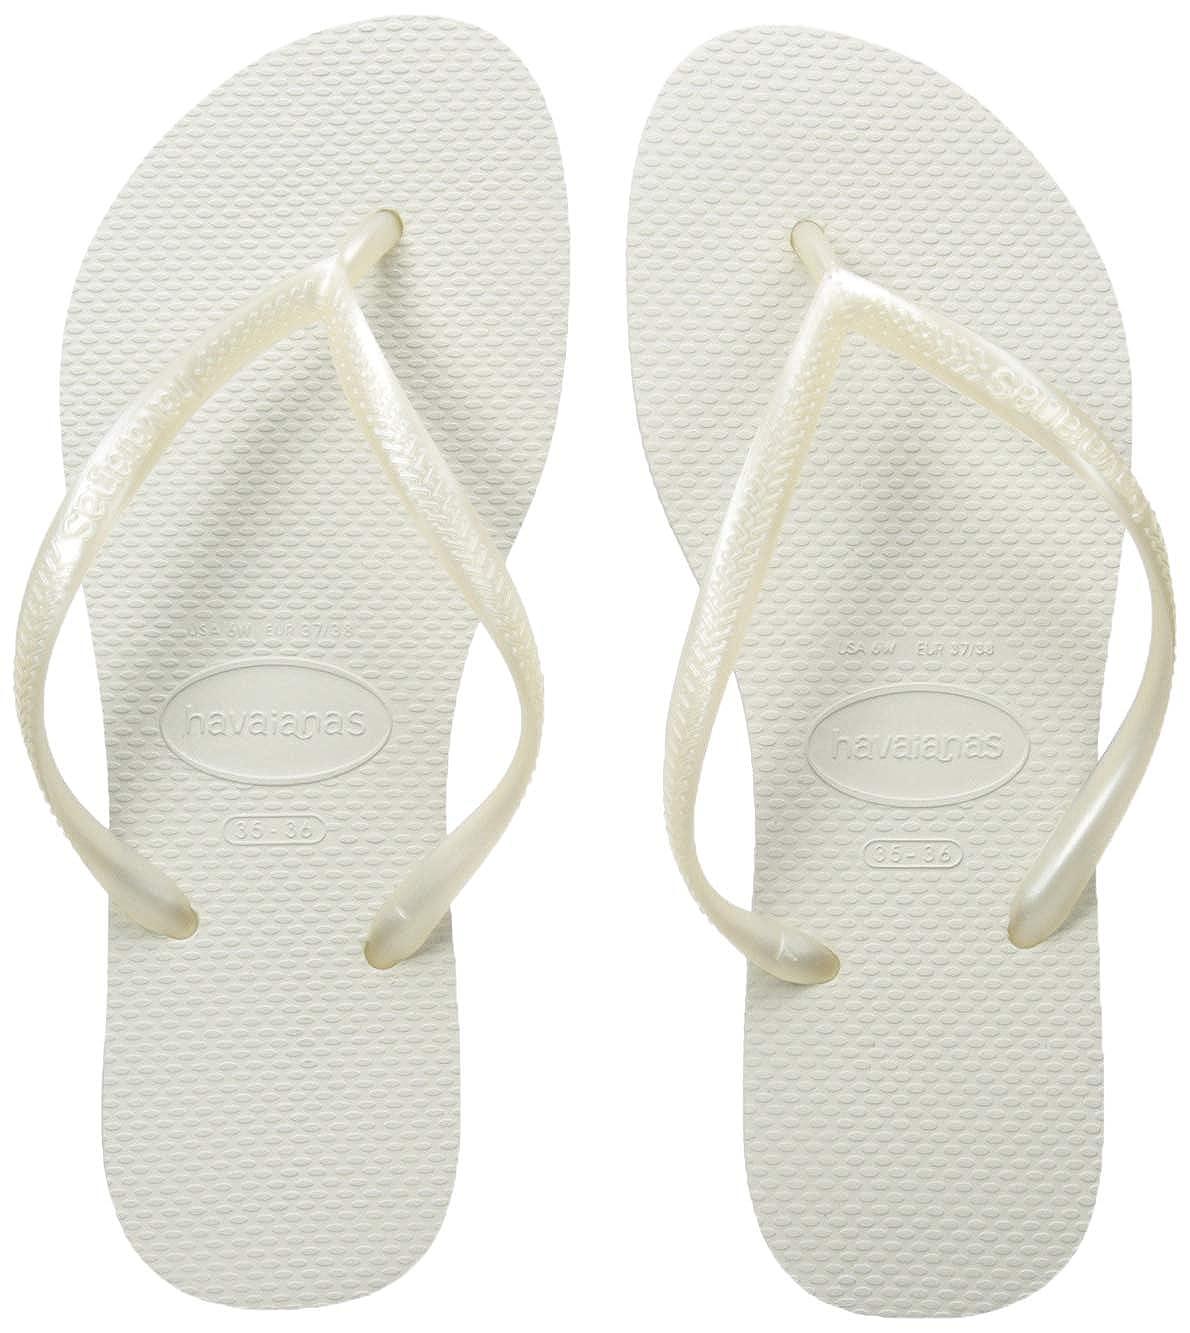 ca5bb21d6 Havaianas Women s Slim Flip Flops  Amazon.co.uk  Shoes   Bags